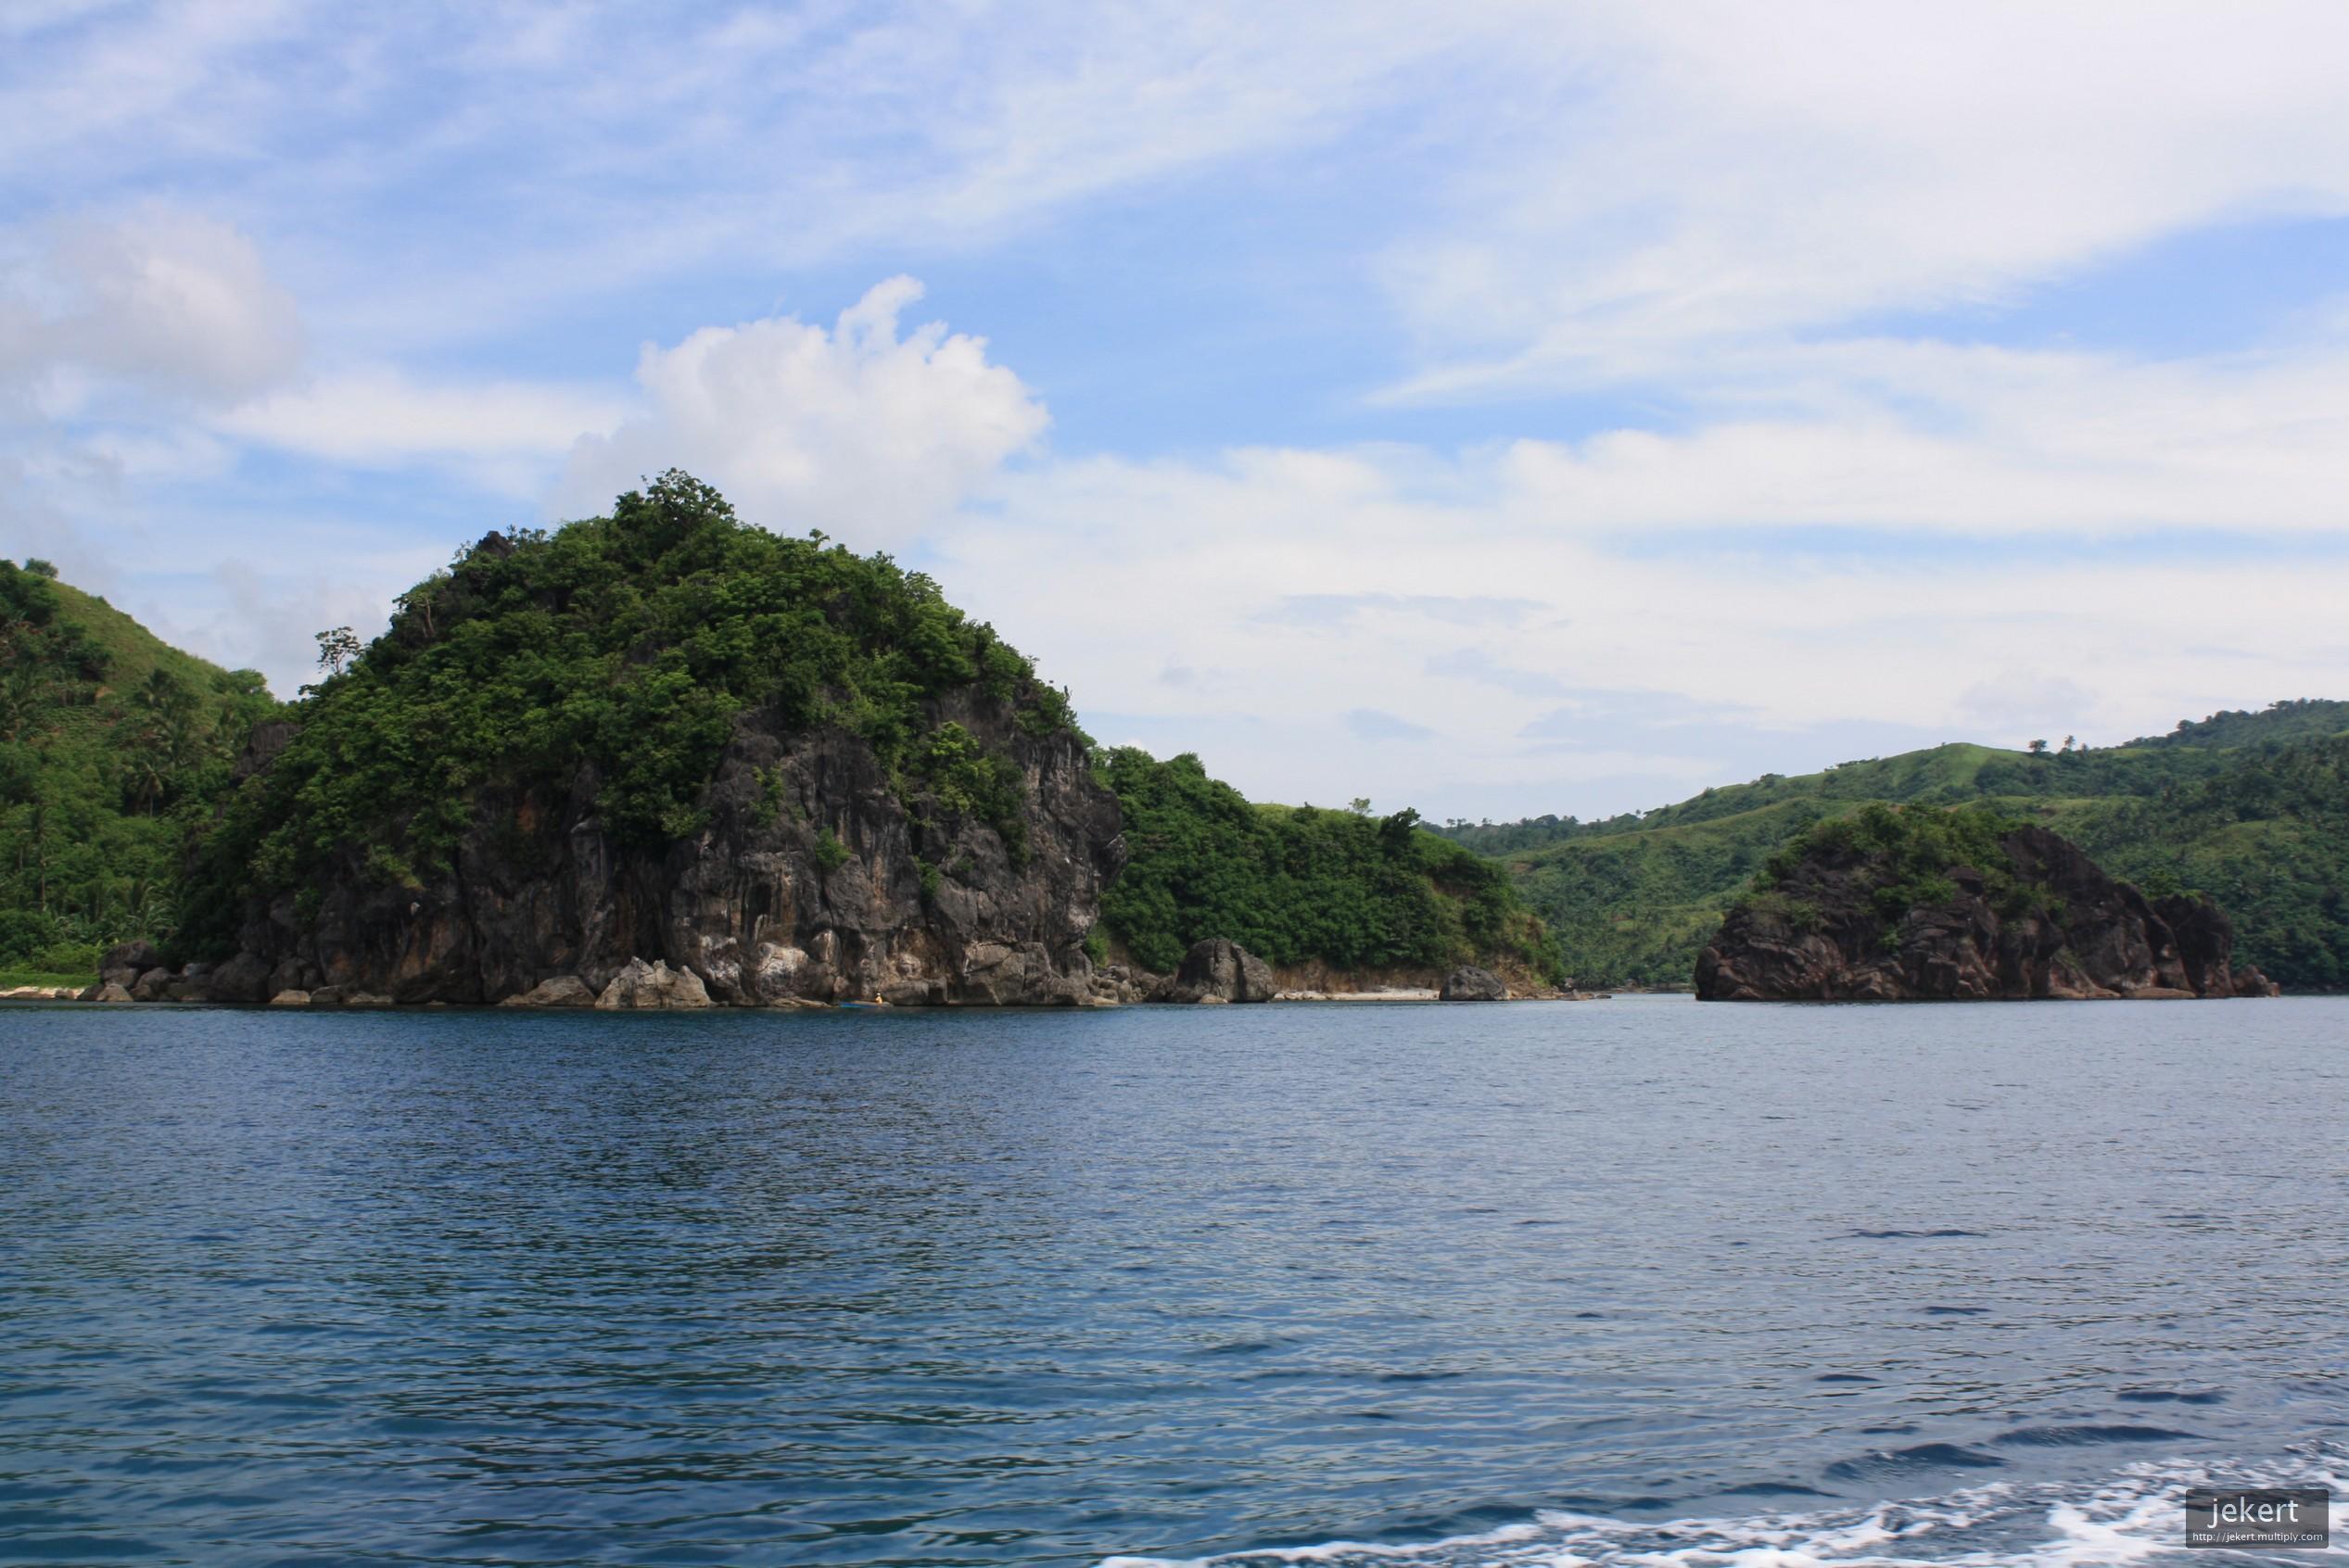 Bicol Region (Region V Profile)